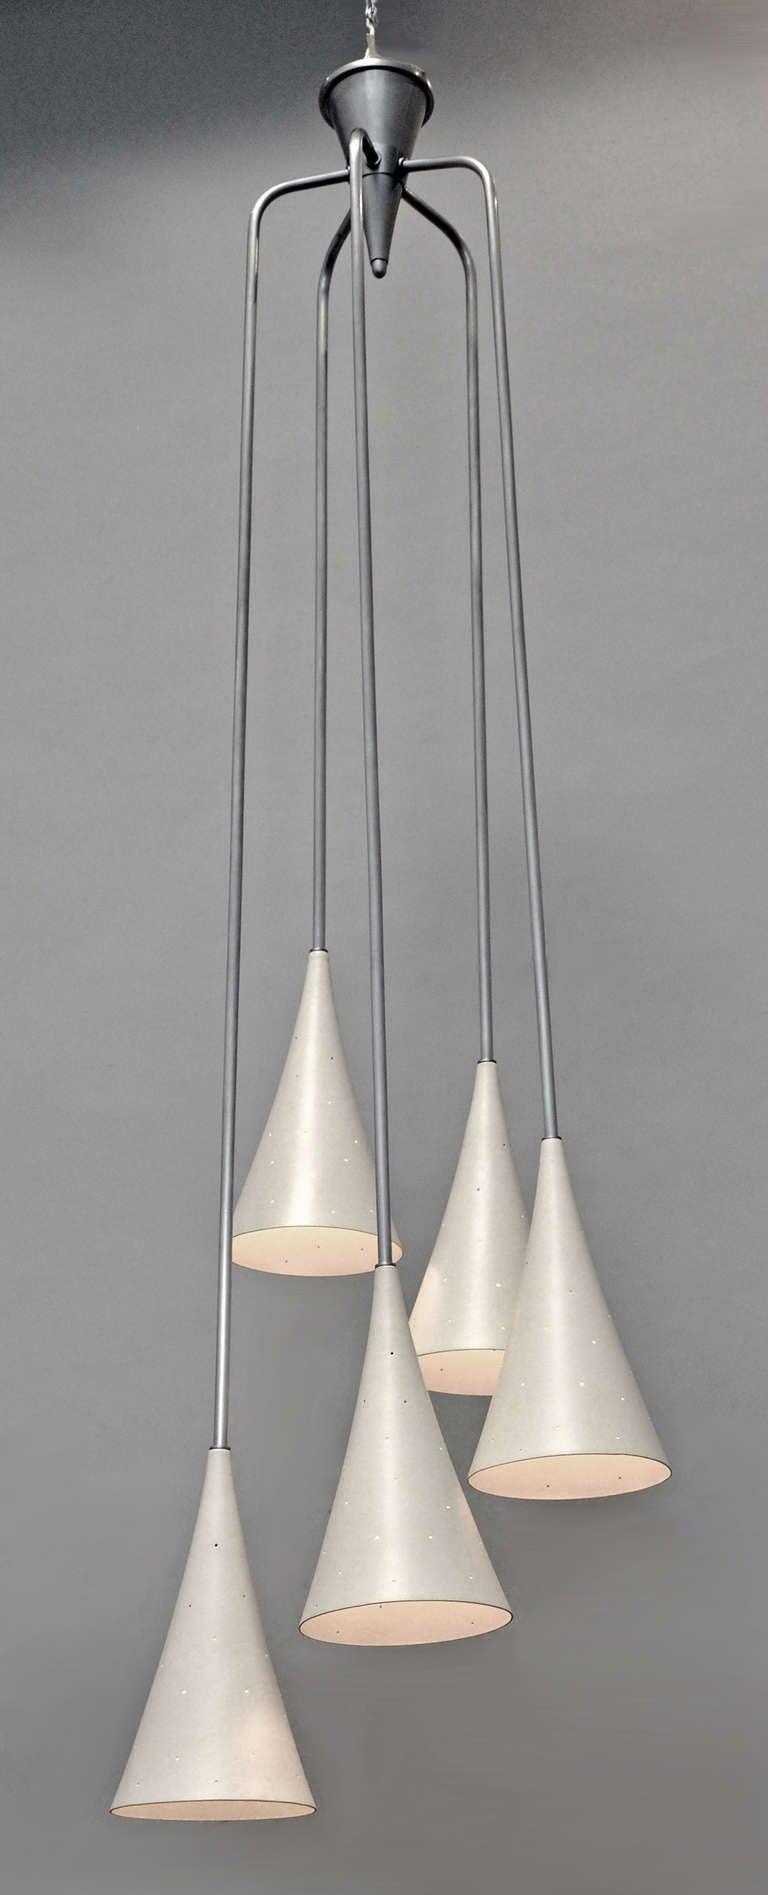 italian mid century modern hanging lamp at 1stdibs. Black Bedroom Furniture Sets. Home Design Ideas